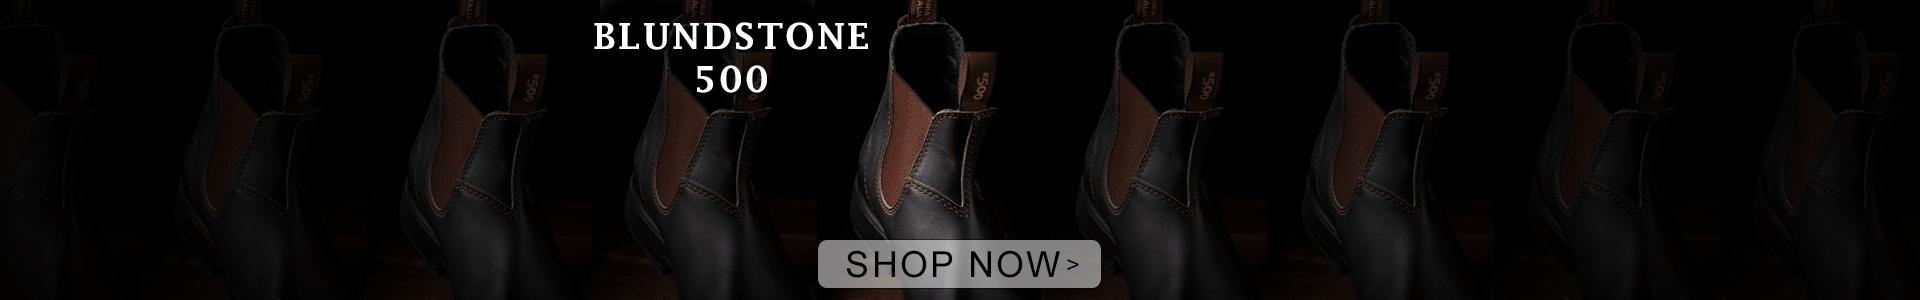 Shop Blundstone 500